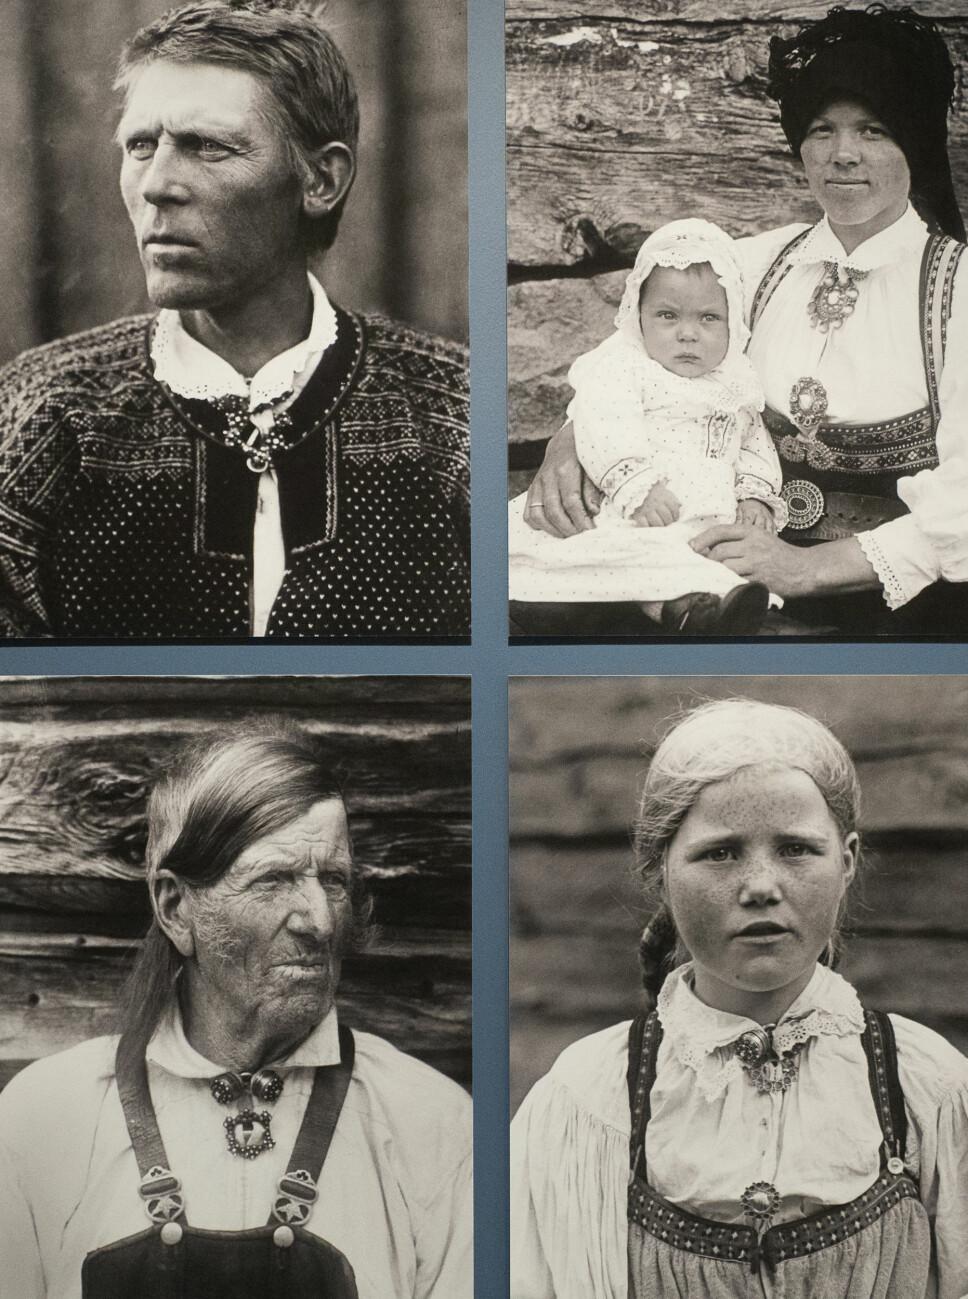 <b>LANGSKALLER:</b> Valle i Setesdal ble ansett som et kjerneområde for den langskallede nordiske rasen. På bildet ser vi Torleiv Bjugsson Aakre (1880–1972), Birgit Eivindsdatter Brottveit (f. Brokka) (1900–1989), Ånund Drengsson Rike (1843–1928) og Jorånd Olsdatter Harstad (f. Haugen) (1913–1993).